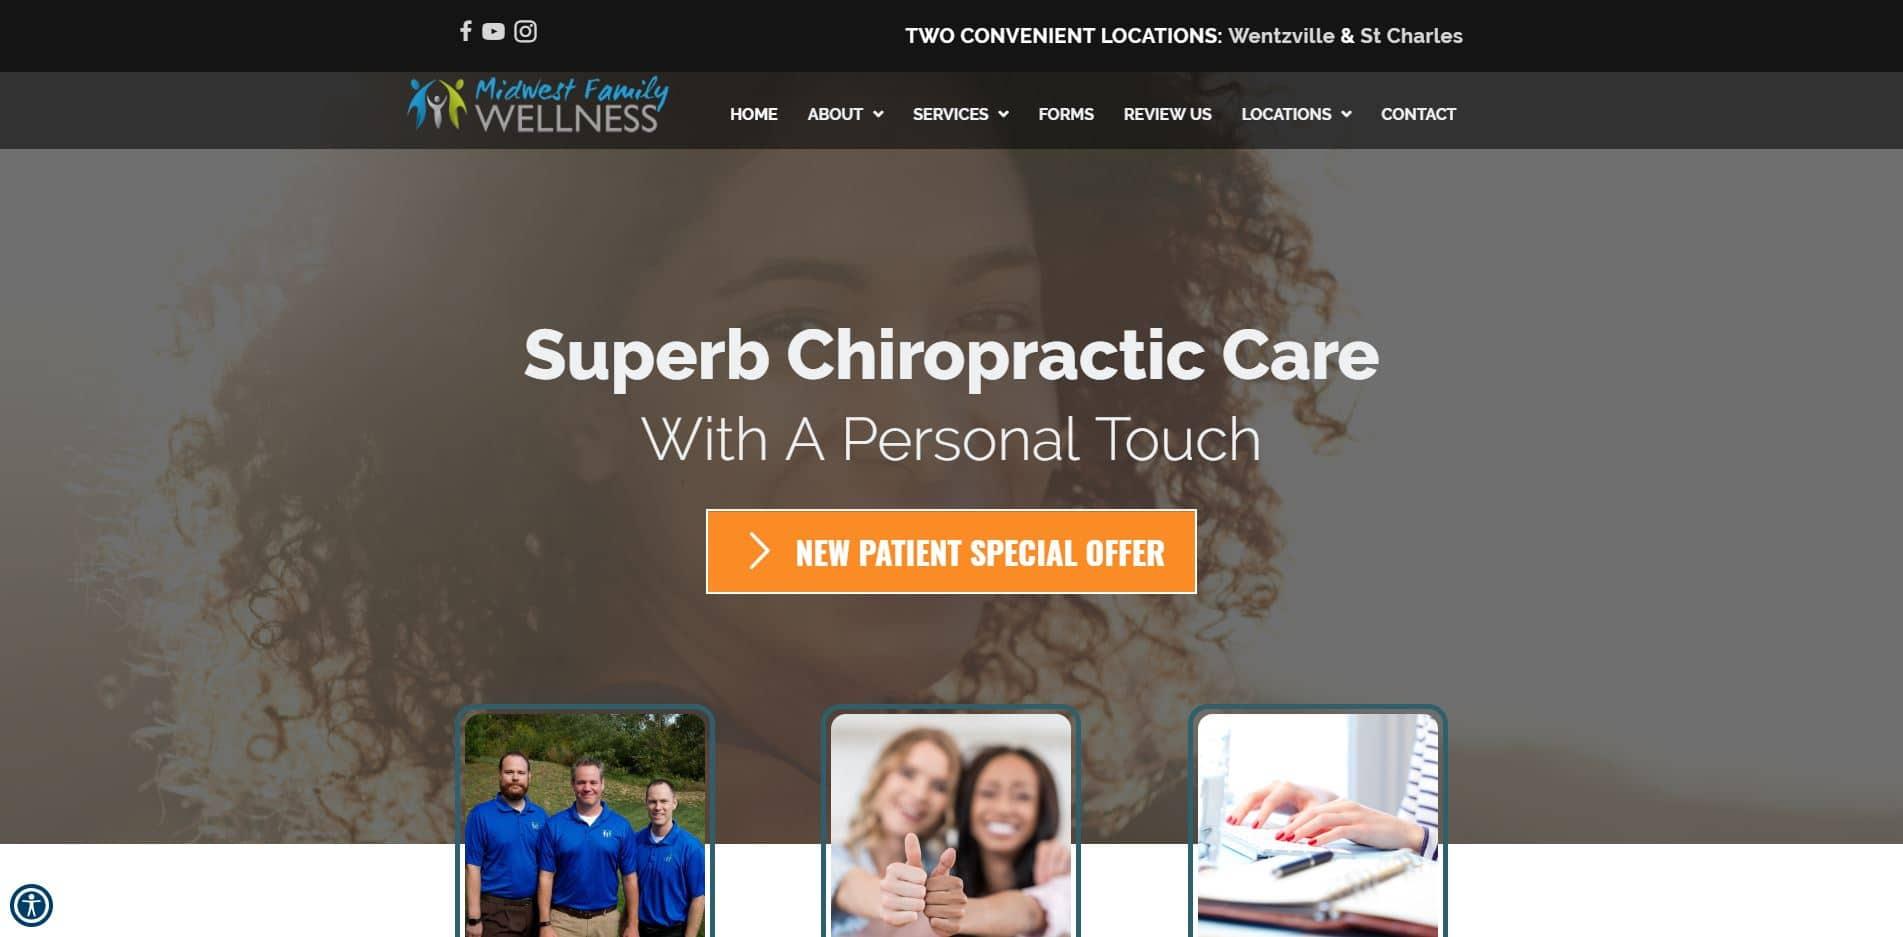 Chiropractor in Wentzville